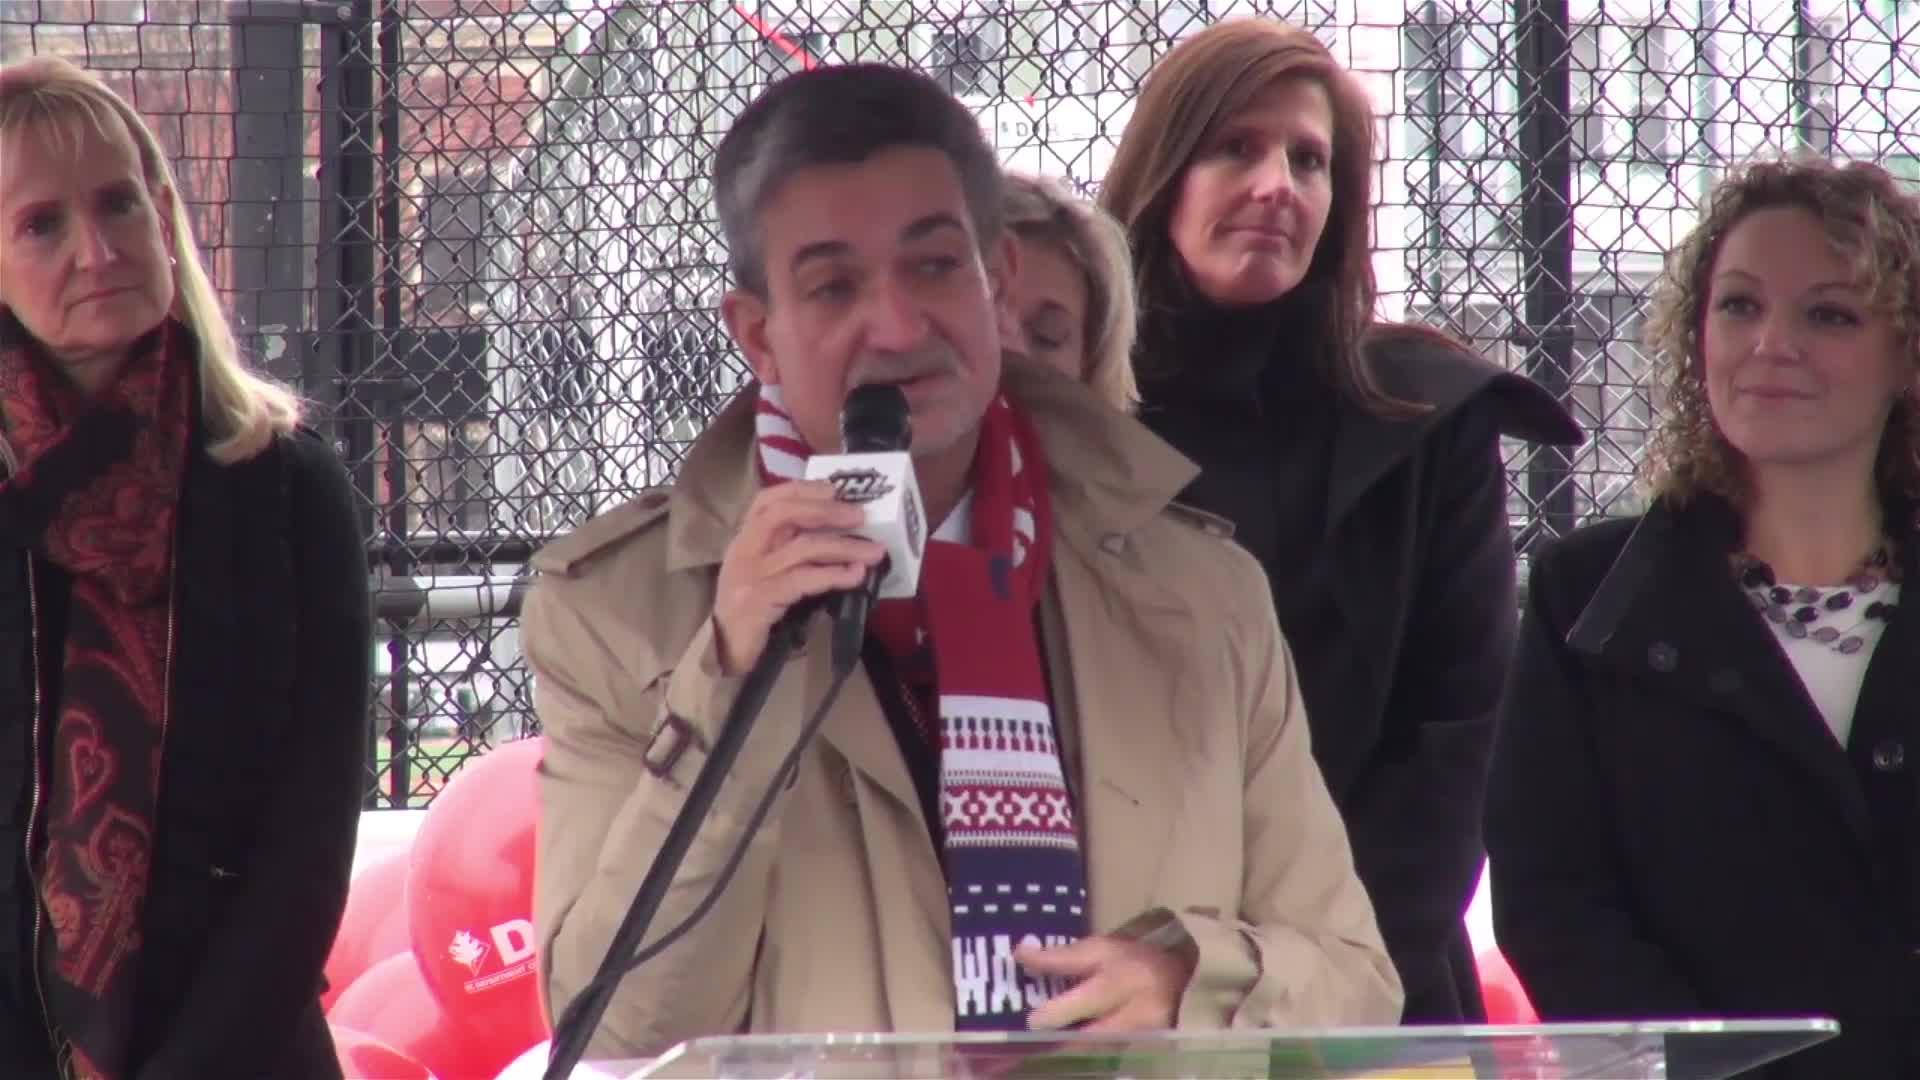 Ted Leonsis, Gary Bettman drop the puck on refurbished D.C. hockey rink (Video)